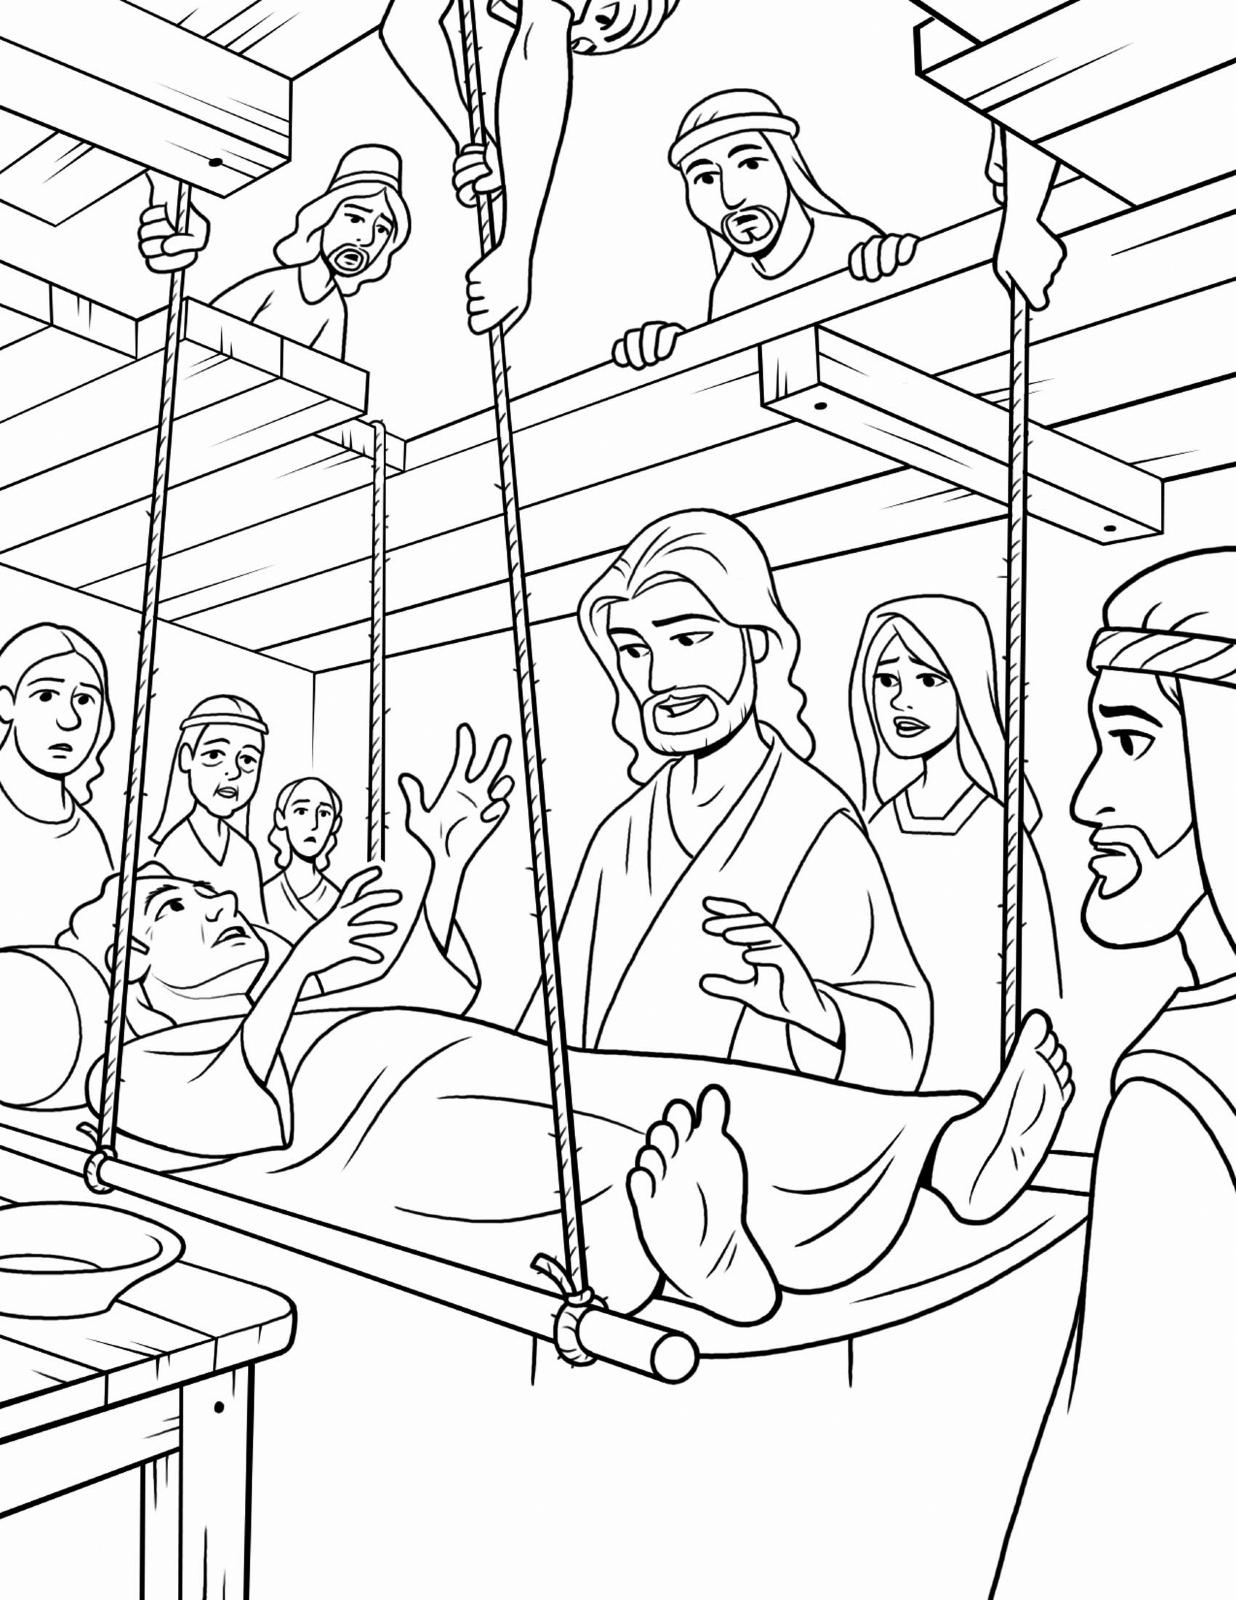 Jesus healing sick, jesus loves me printable coloring pages